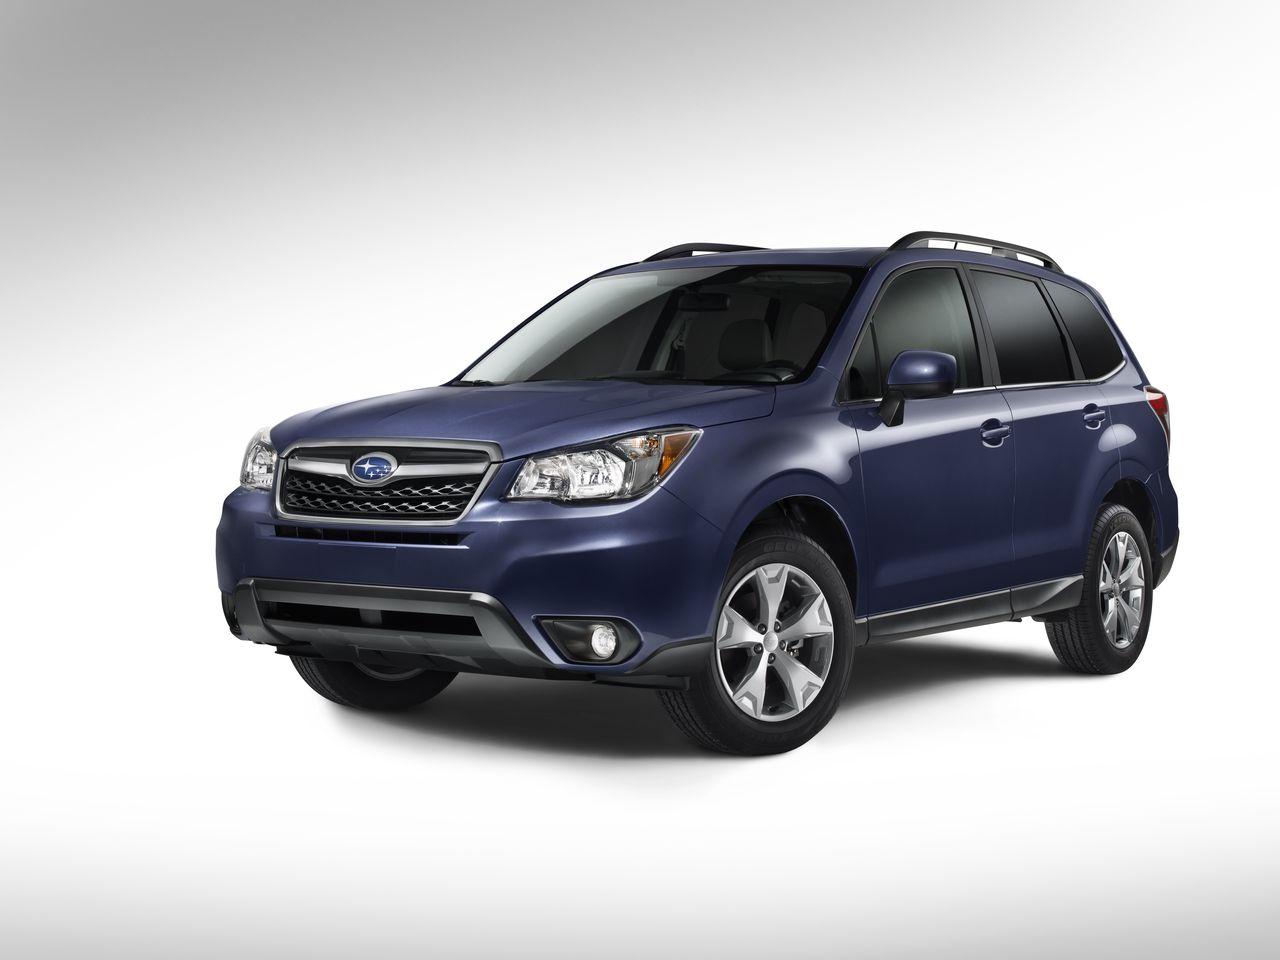 2014 Subaru Forester Preview